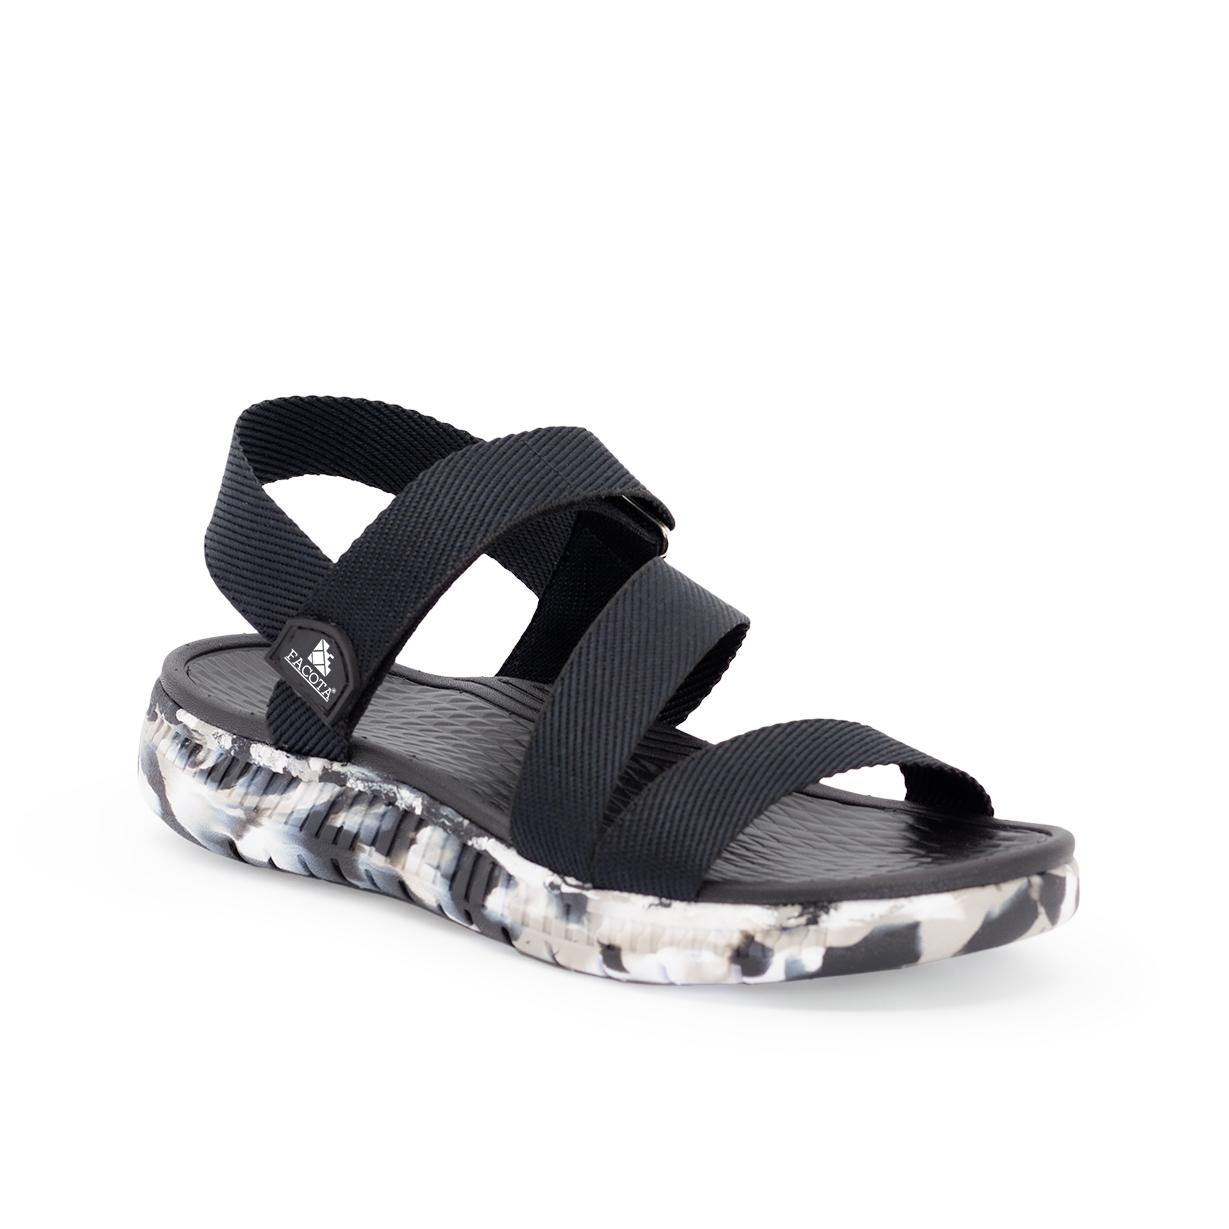 Giày sandal nam Facota V1 Sport HA03 sandal quai chéo đế camo - sandal quai dù